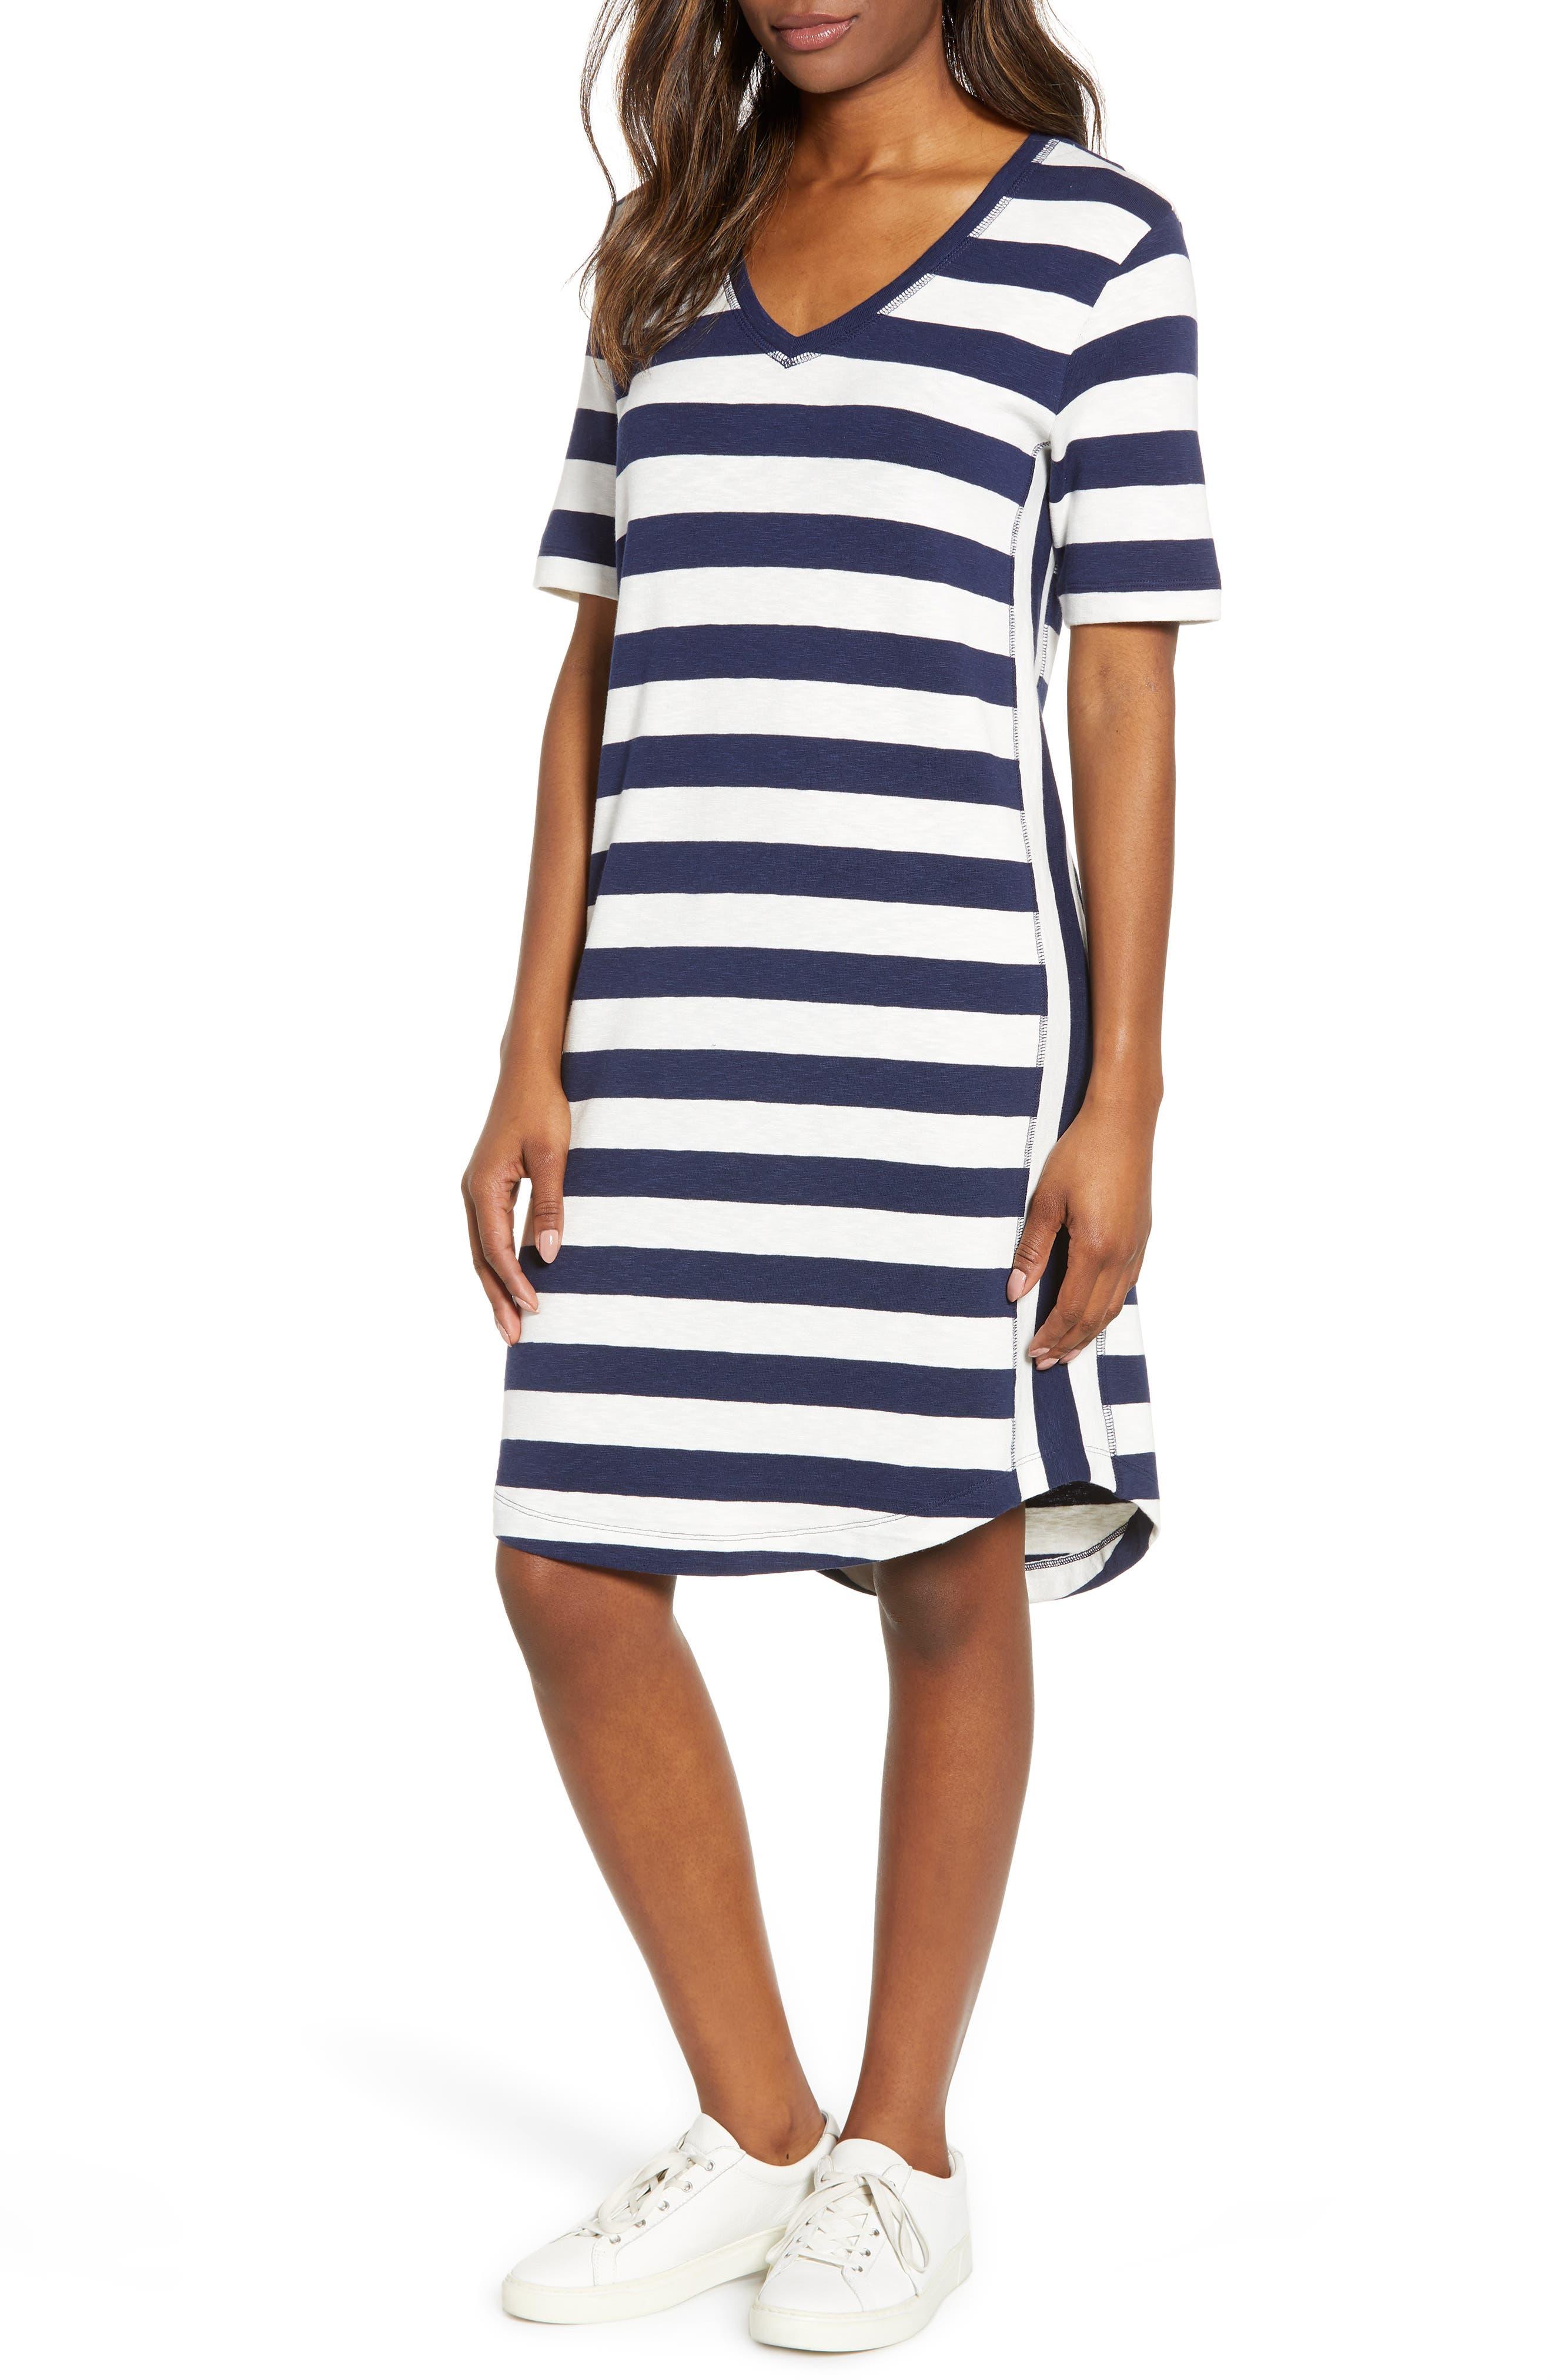 Petite Caslon Slub Knit Dress, Blue